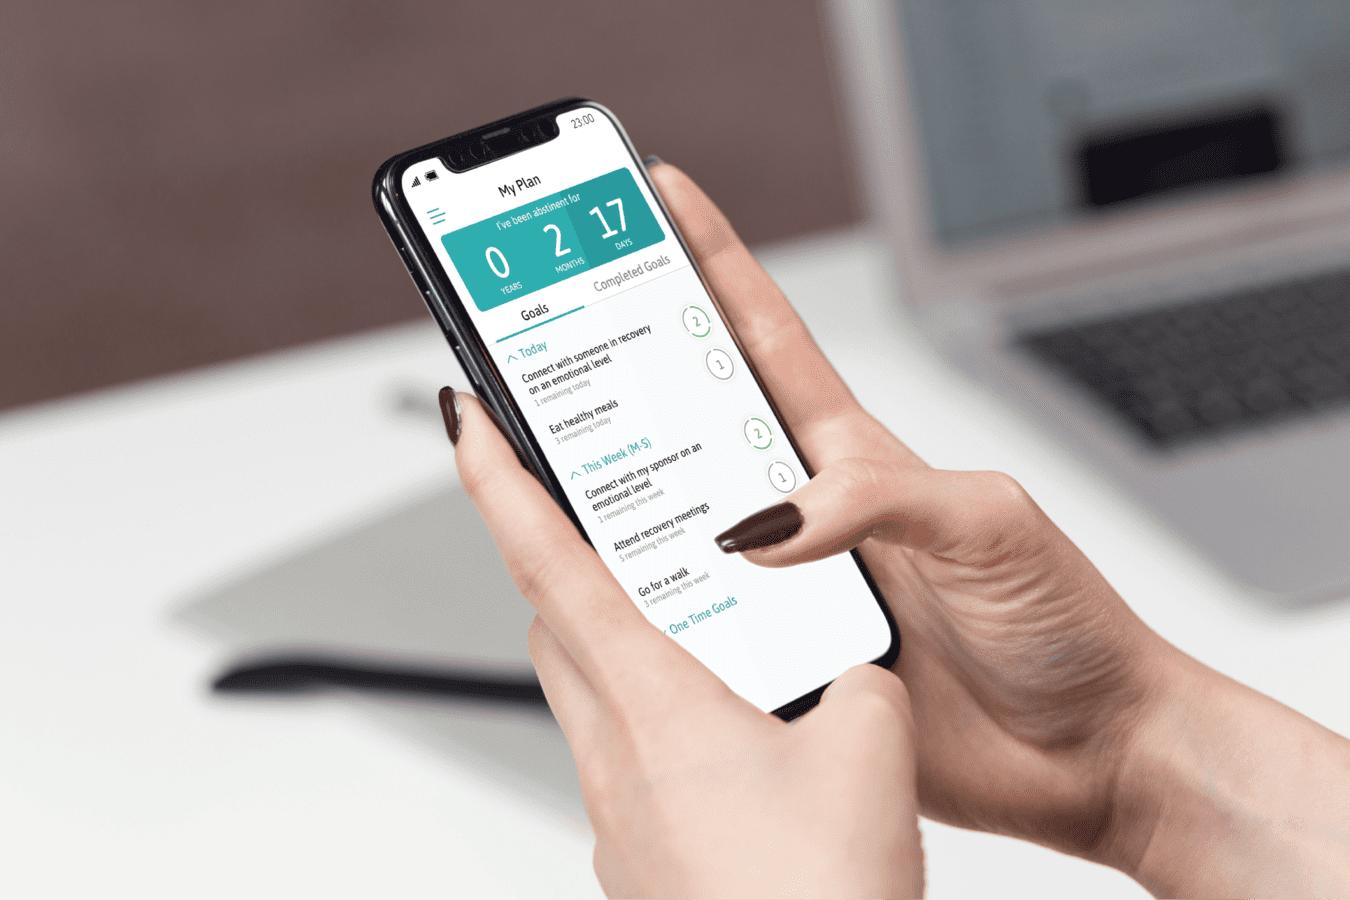 EHN onthewagon mobile app